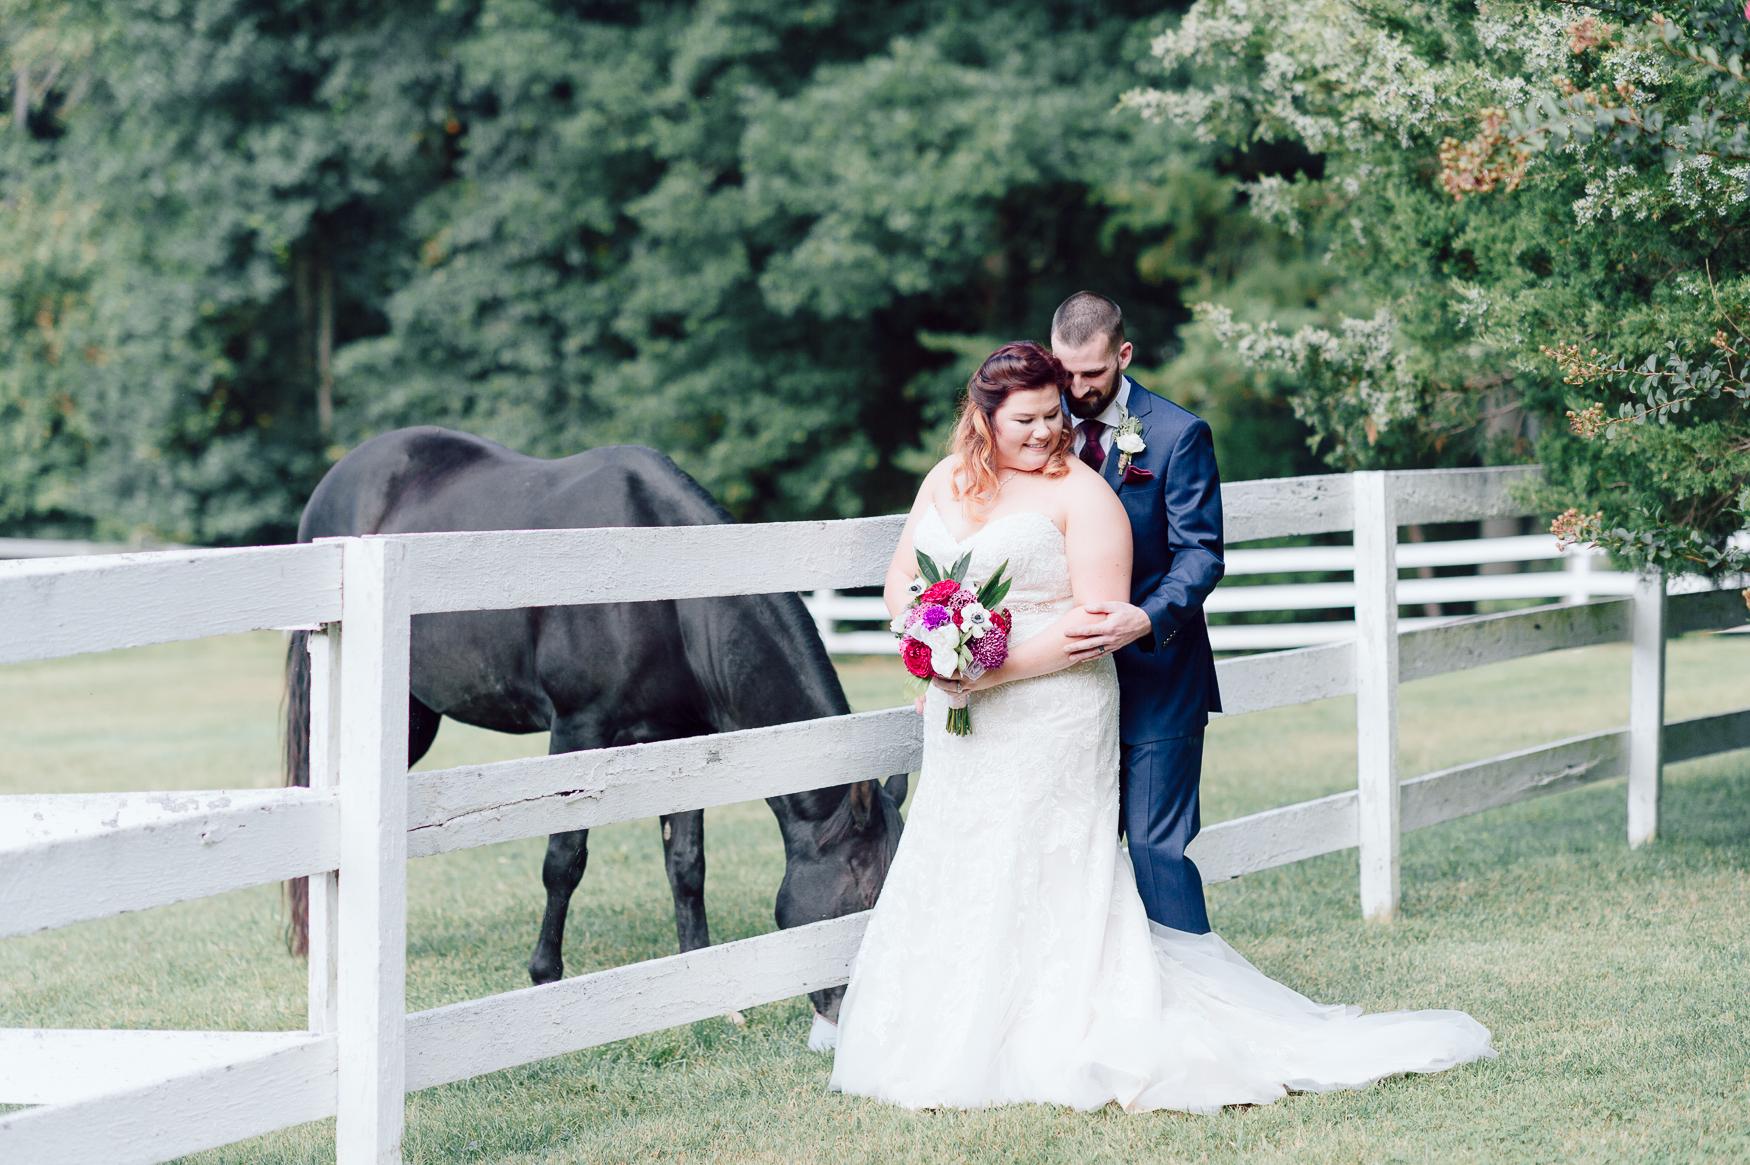 virginiawedding_GlenGarden_rusticwedding_fredericksburg_youseephotography_KellySteven (79).jpg